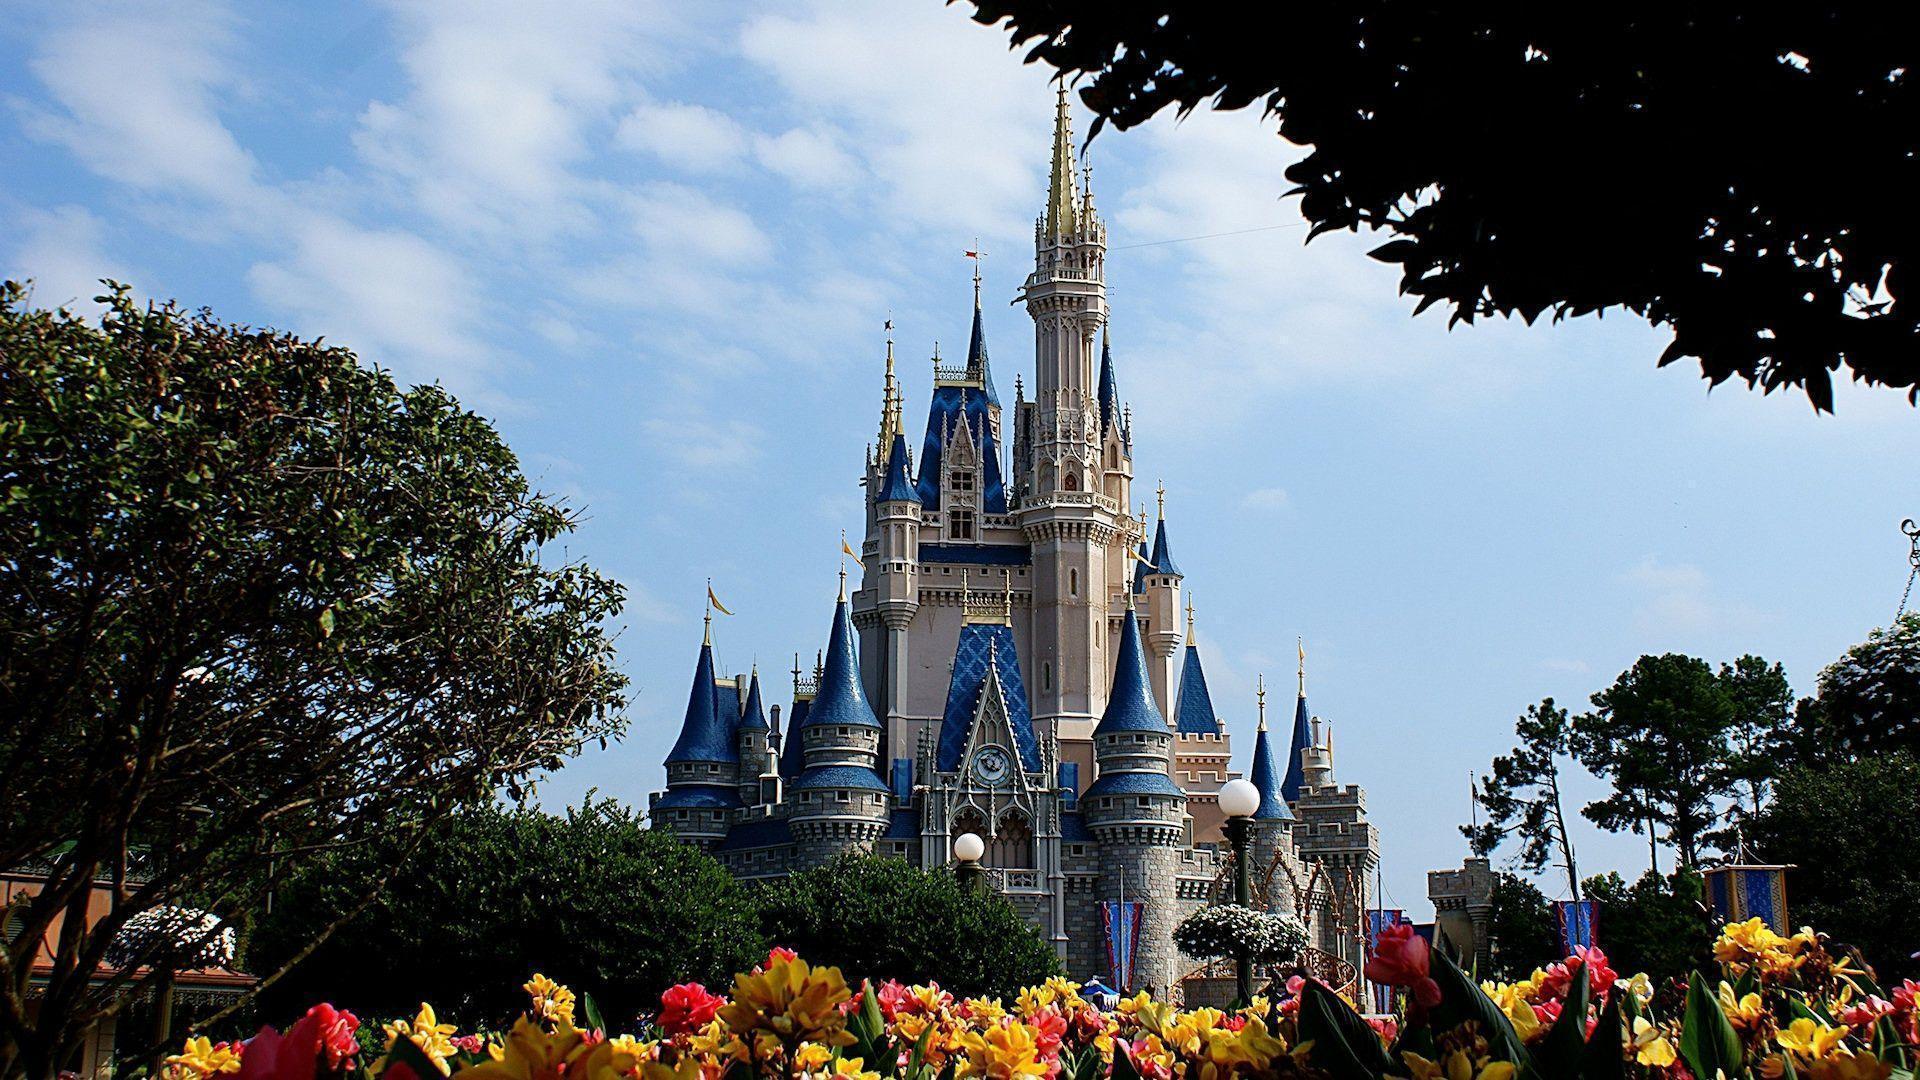 Download Wallpaper Macbook Disney - vjp9Z2H  Best Photo Reference_40774.jpg